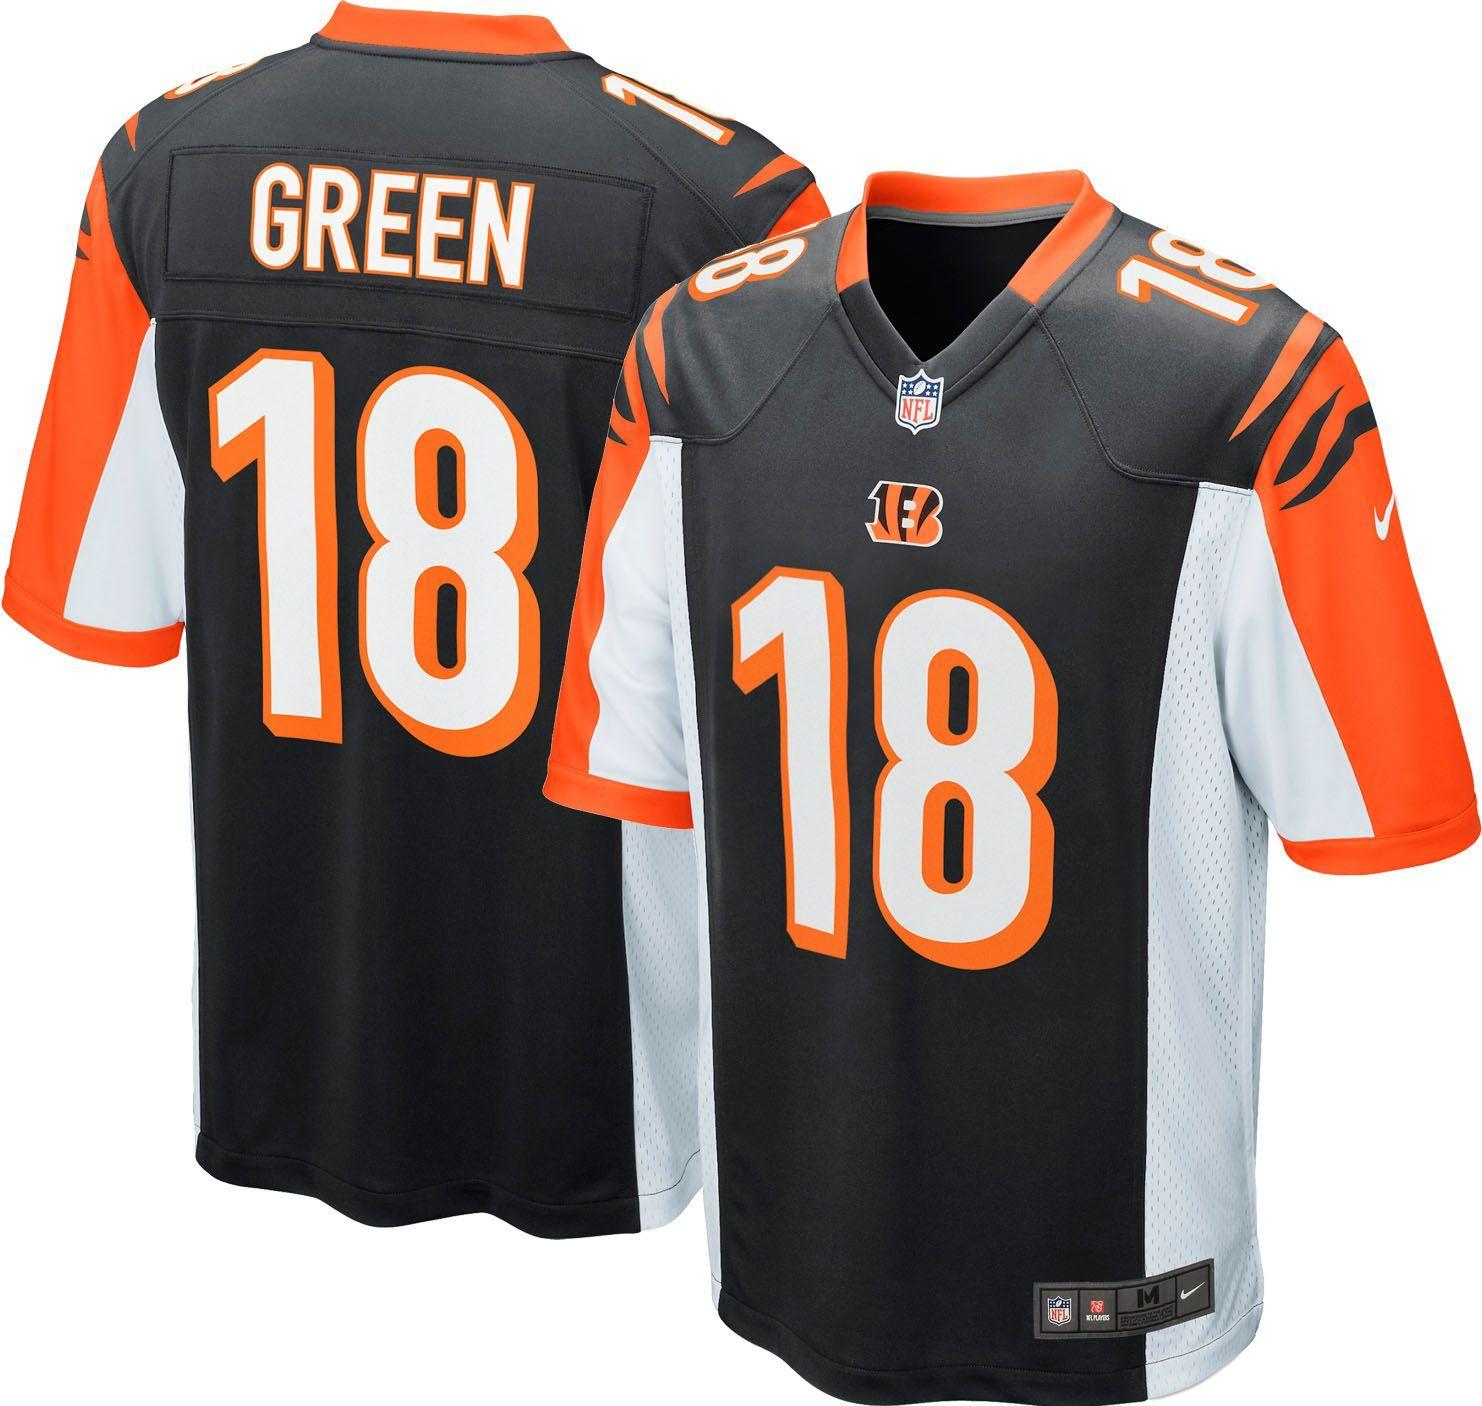 873750f7 Nike Youth Home Game Jersey Cincinnati A.J. Green #18, Kids Unisex ...